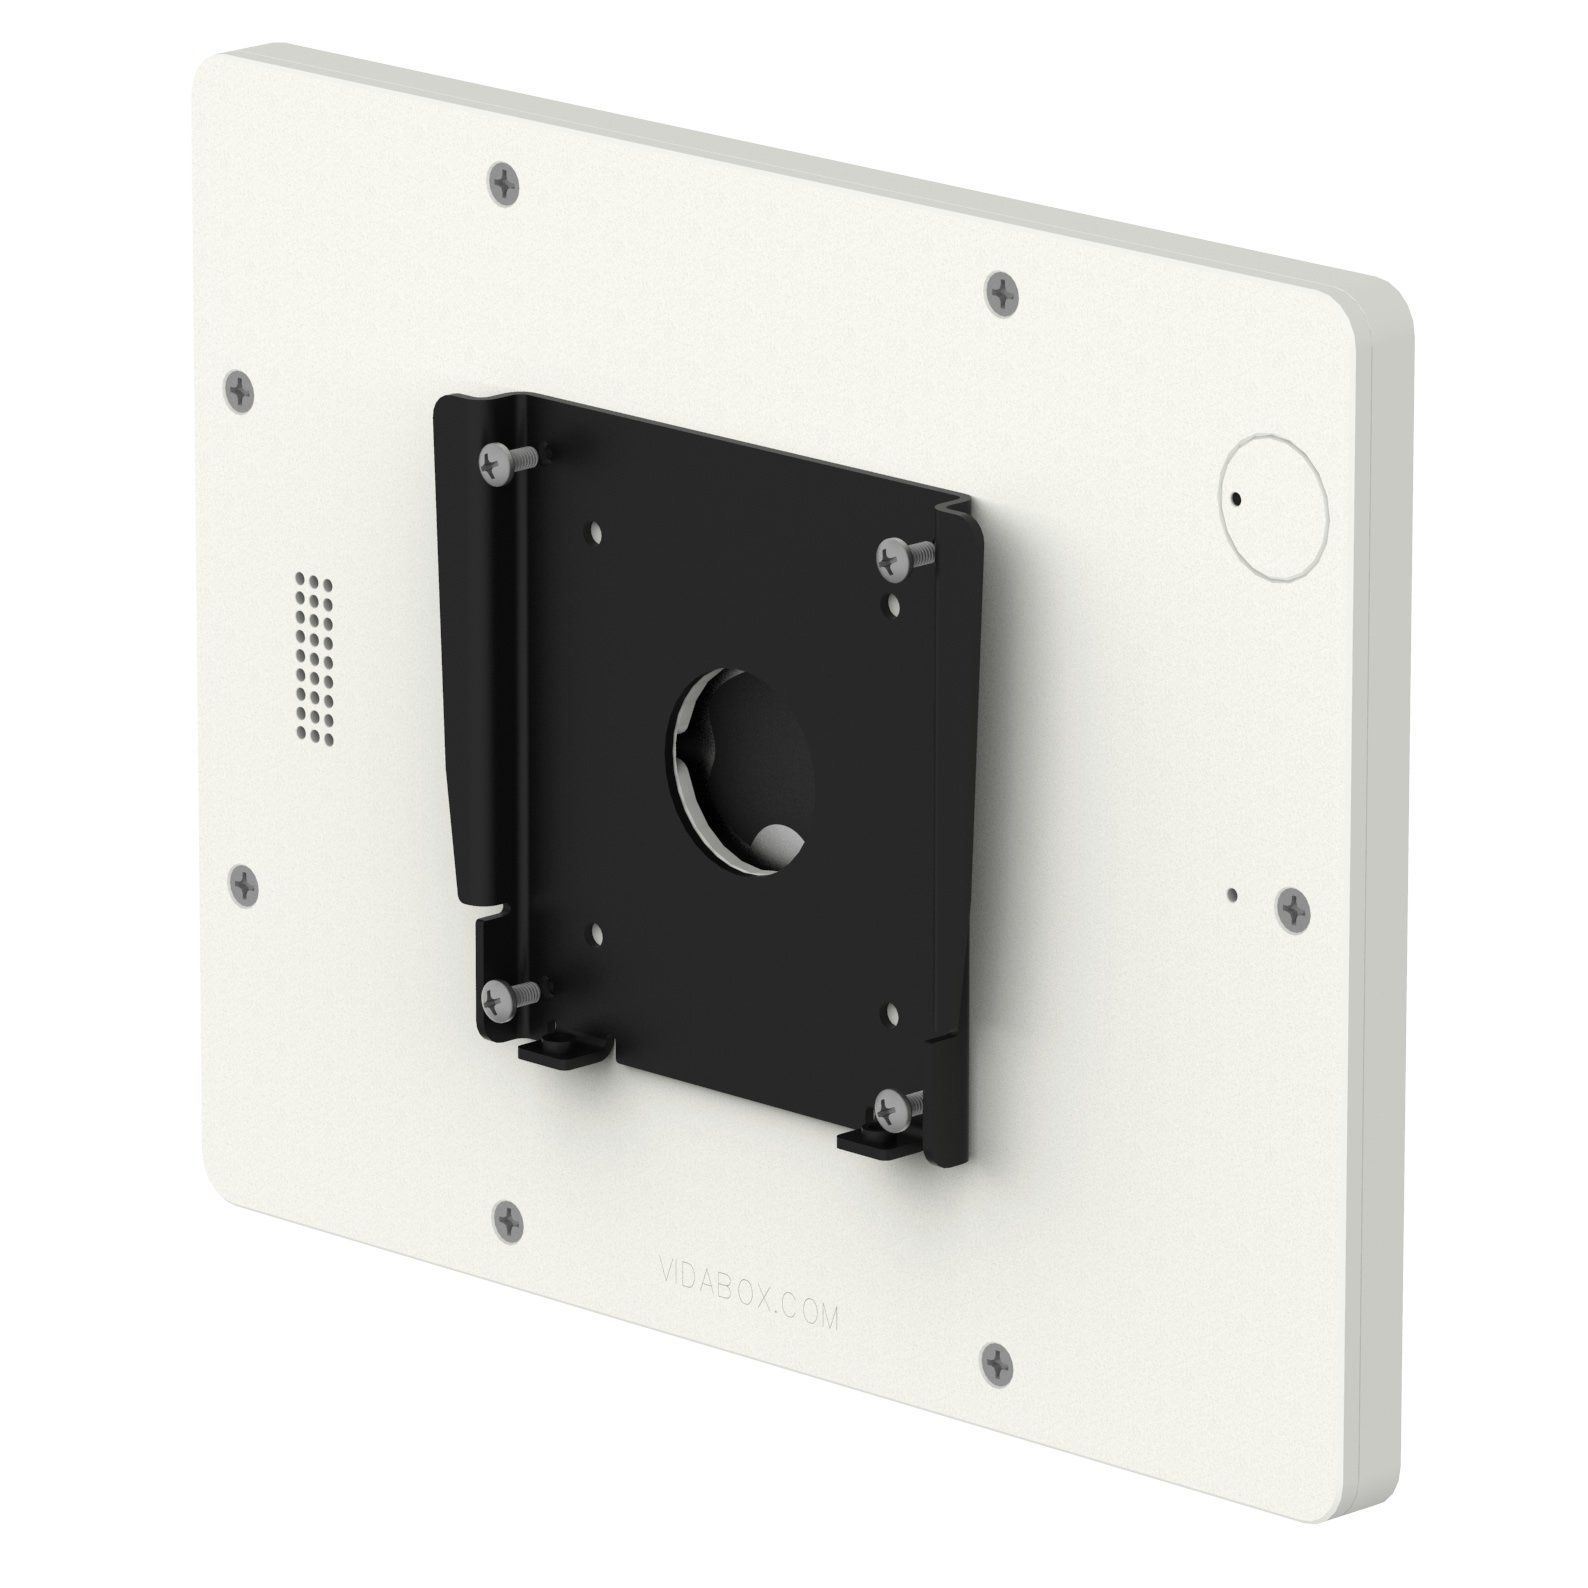 iPad (5th Gen) 9.7/Pro, Air 1/2 White Home Button Covered Fixed Slim VESA Wall Mount [Bundle] by VidaBox Kiosks (Image #6)